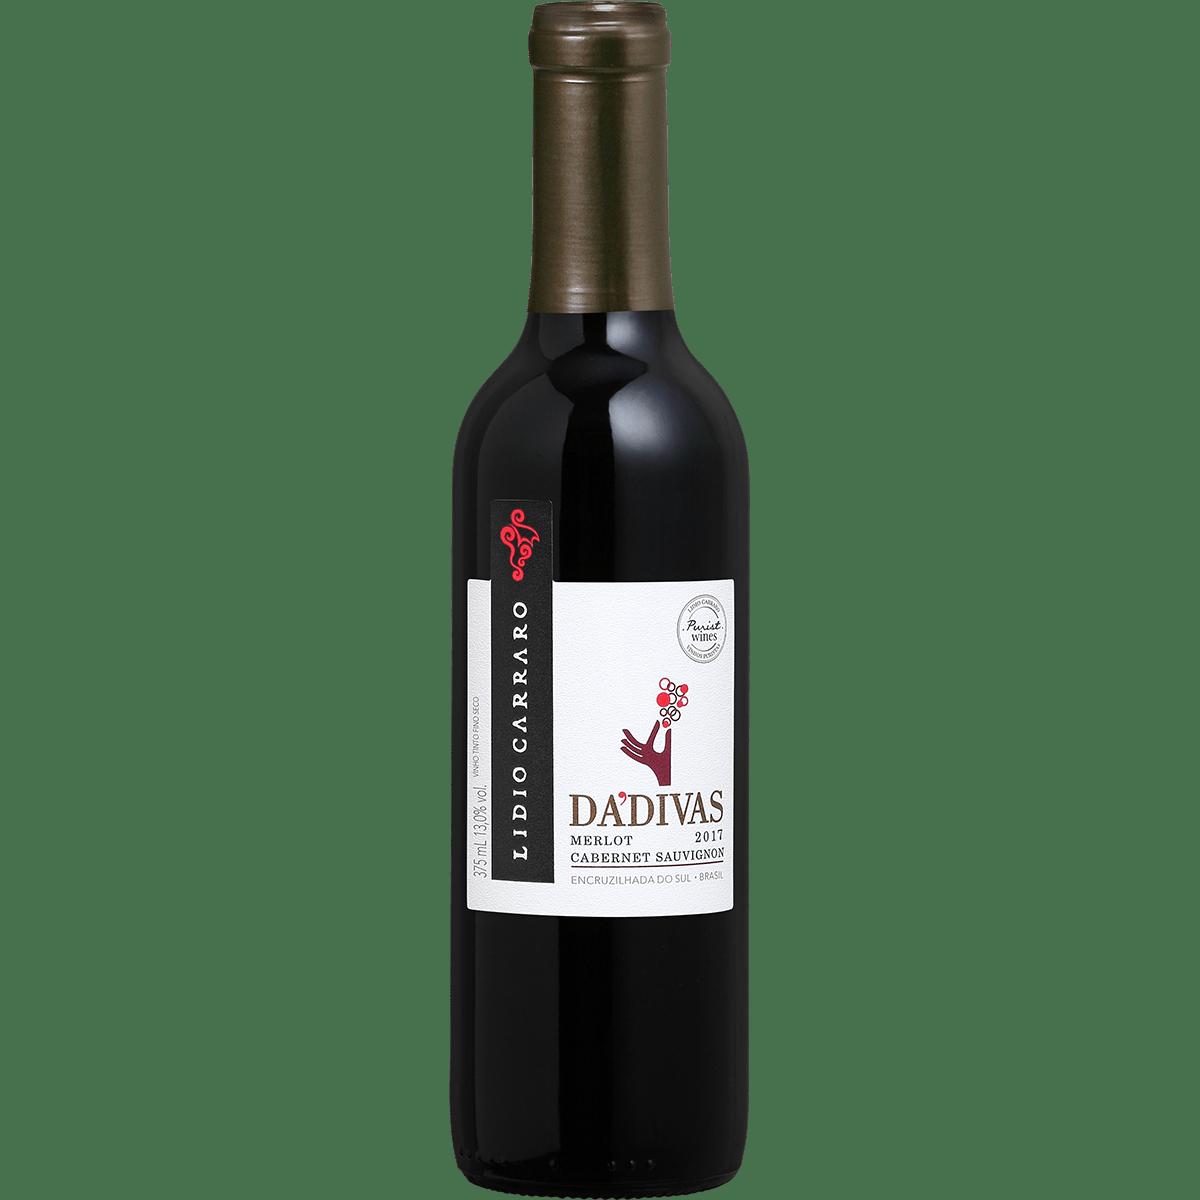 Vinho Lidio Carraro Dádivas Merlot/Cabernet Sauvignon 2017 375ml